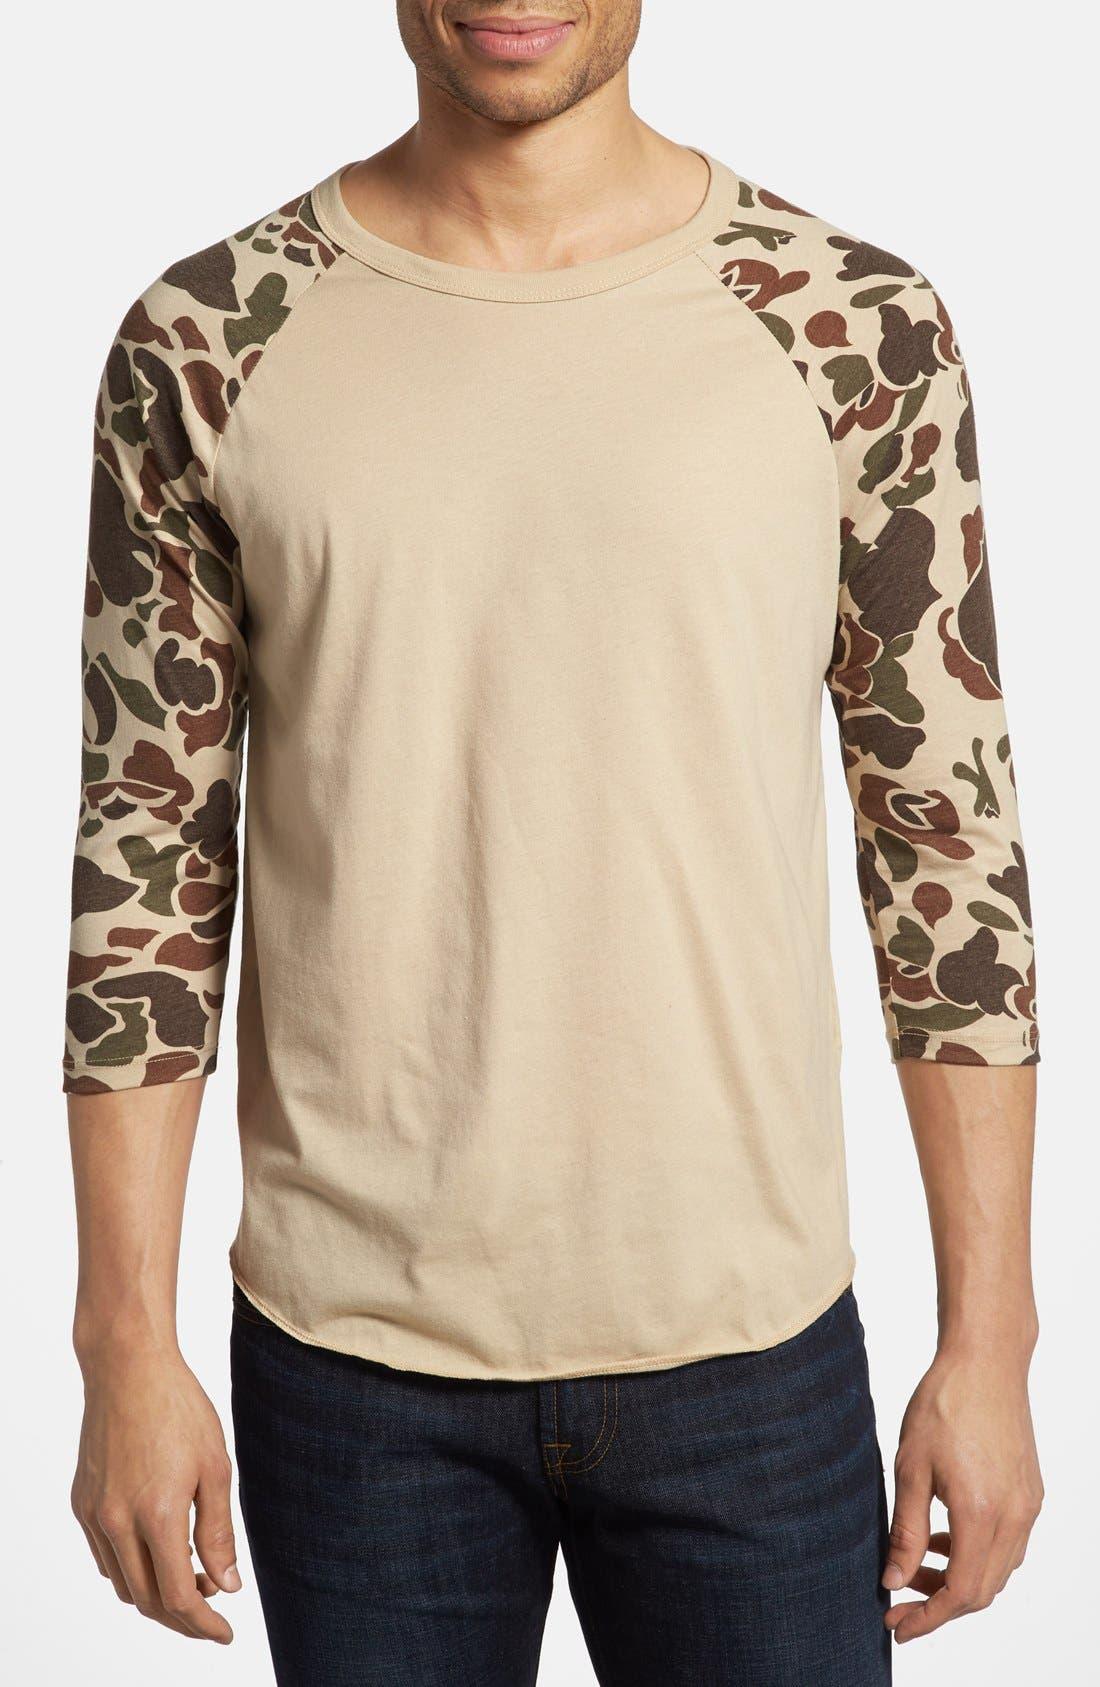 Alternate Image 1 Selected - Obey 'Camo' Baseball T-Shirt